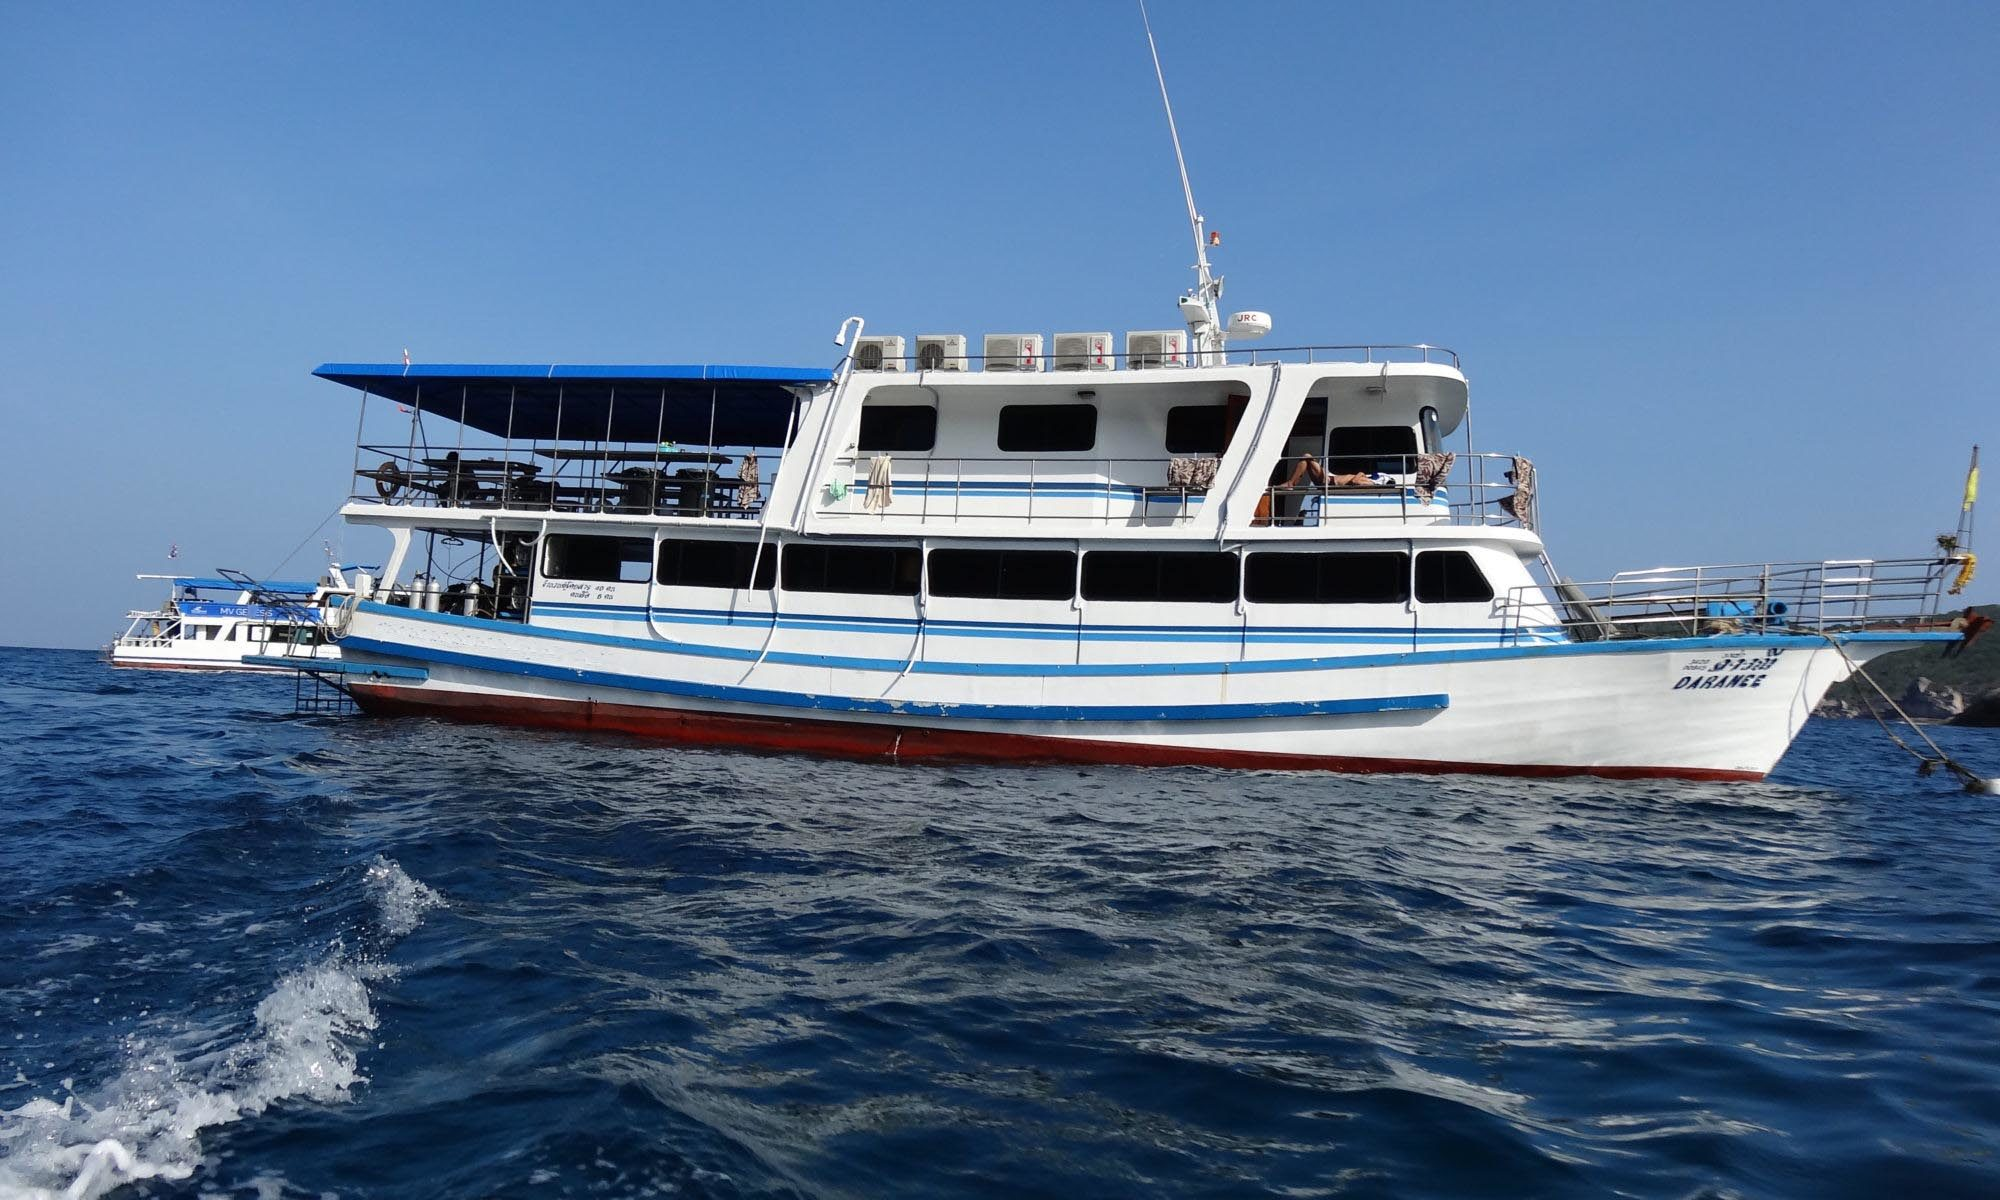 MV Daranee - Phuket Tauchen